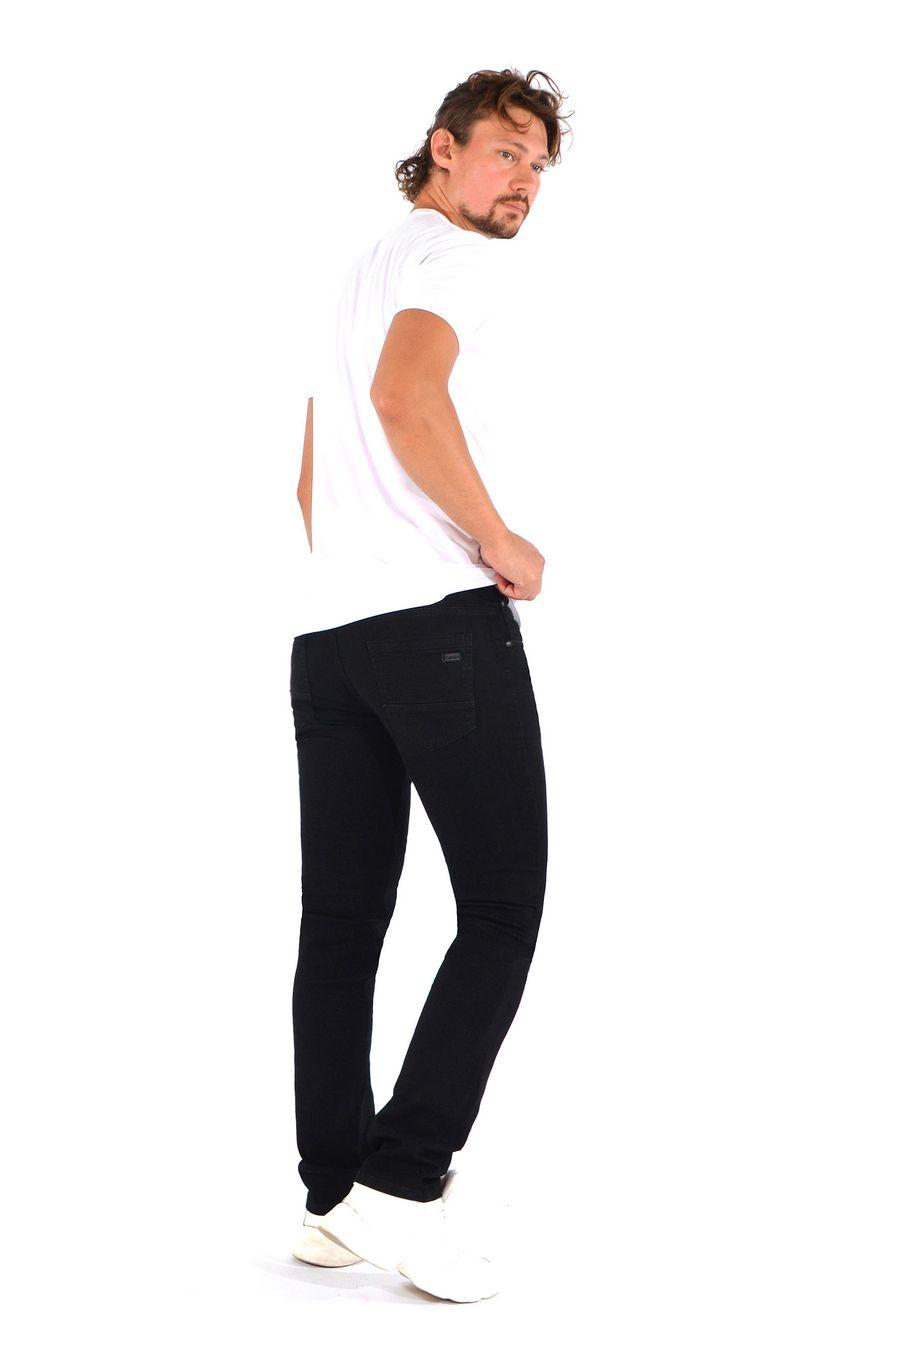 Джинсы мужские Luxury Vision 6030 - фото 3